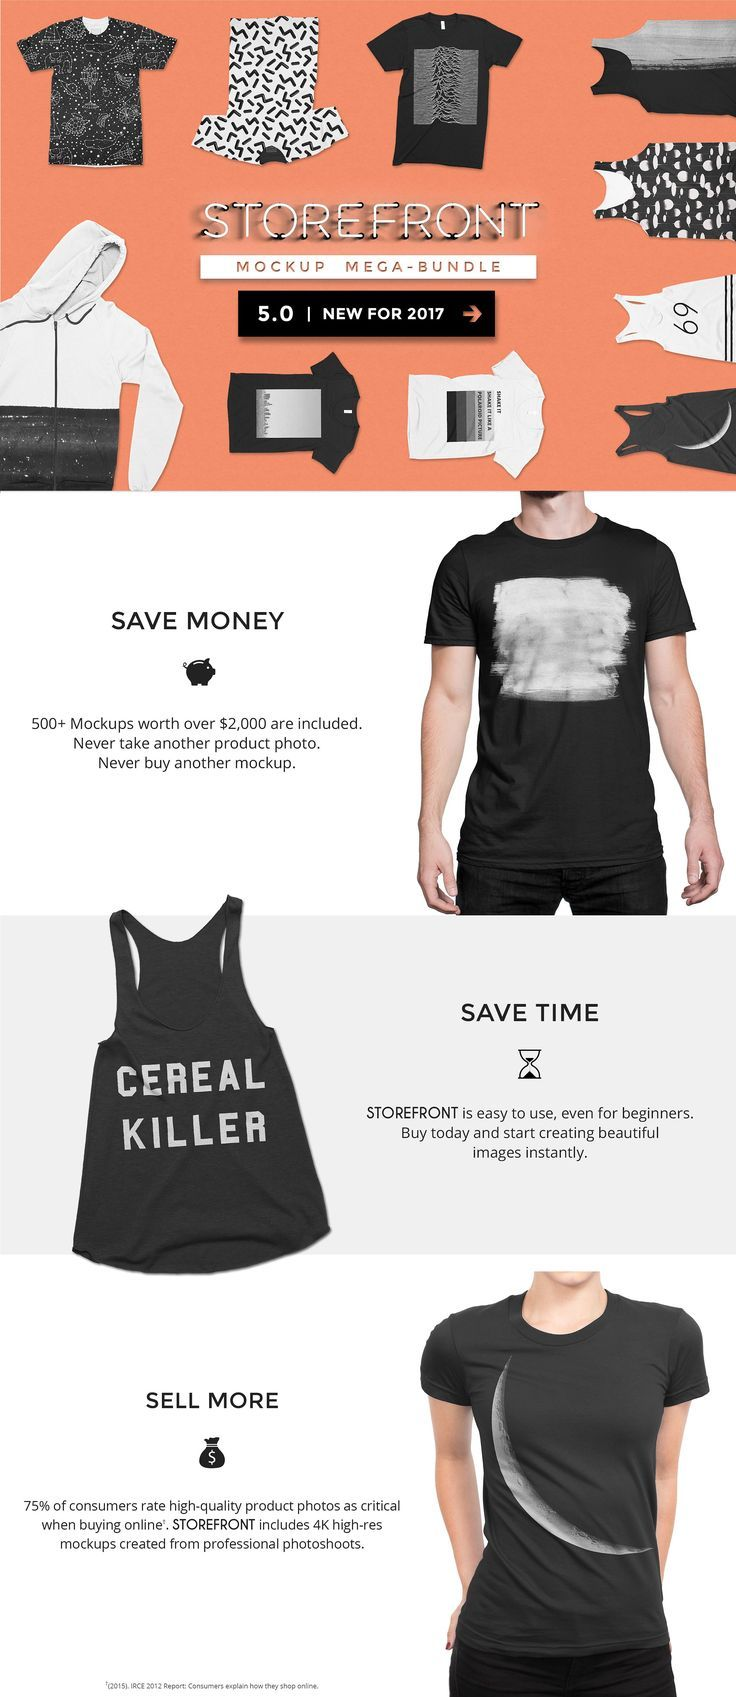 STOREFRONT - Apparel Mockups Bundle by Photific on @creativemarket #ideas #inspiration #digitalart #creativemarket #rmockup #mock-up #psd #design #background #t-shirt